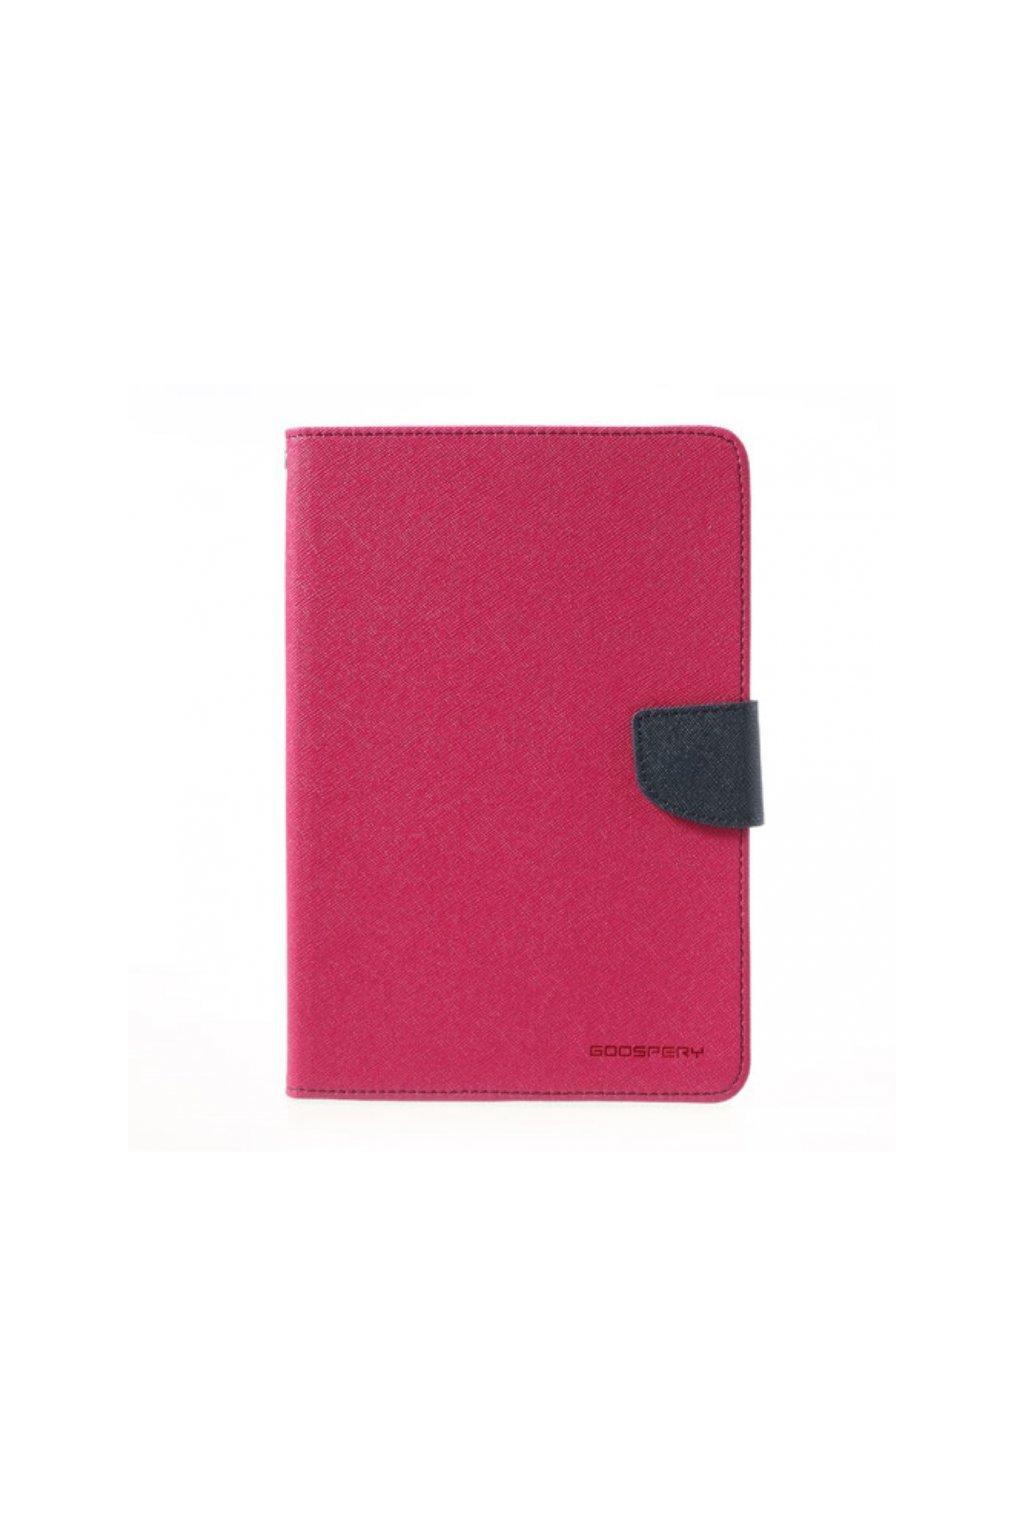 9279 1 pouzdro kryt pro apple ipad mini 4 mercury fancy diary hotpink navy